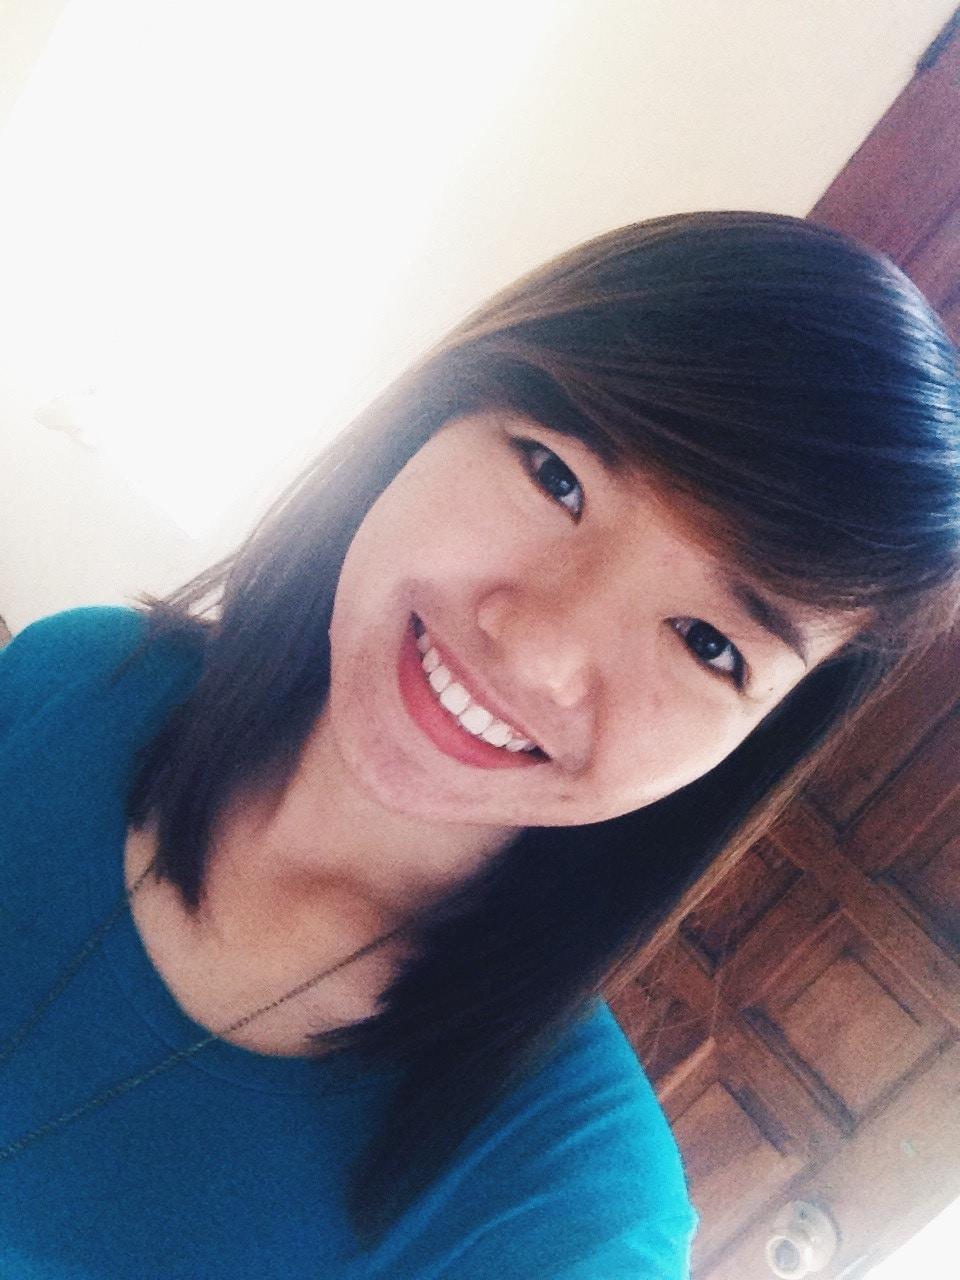 Go to Abigail Lepaopao's profile